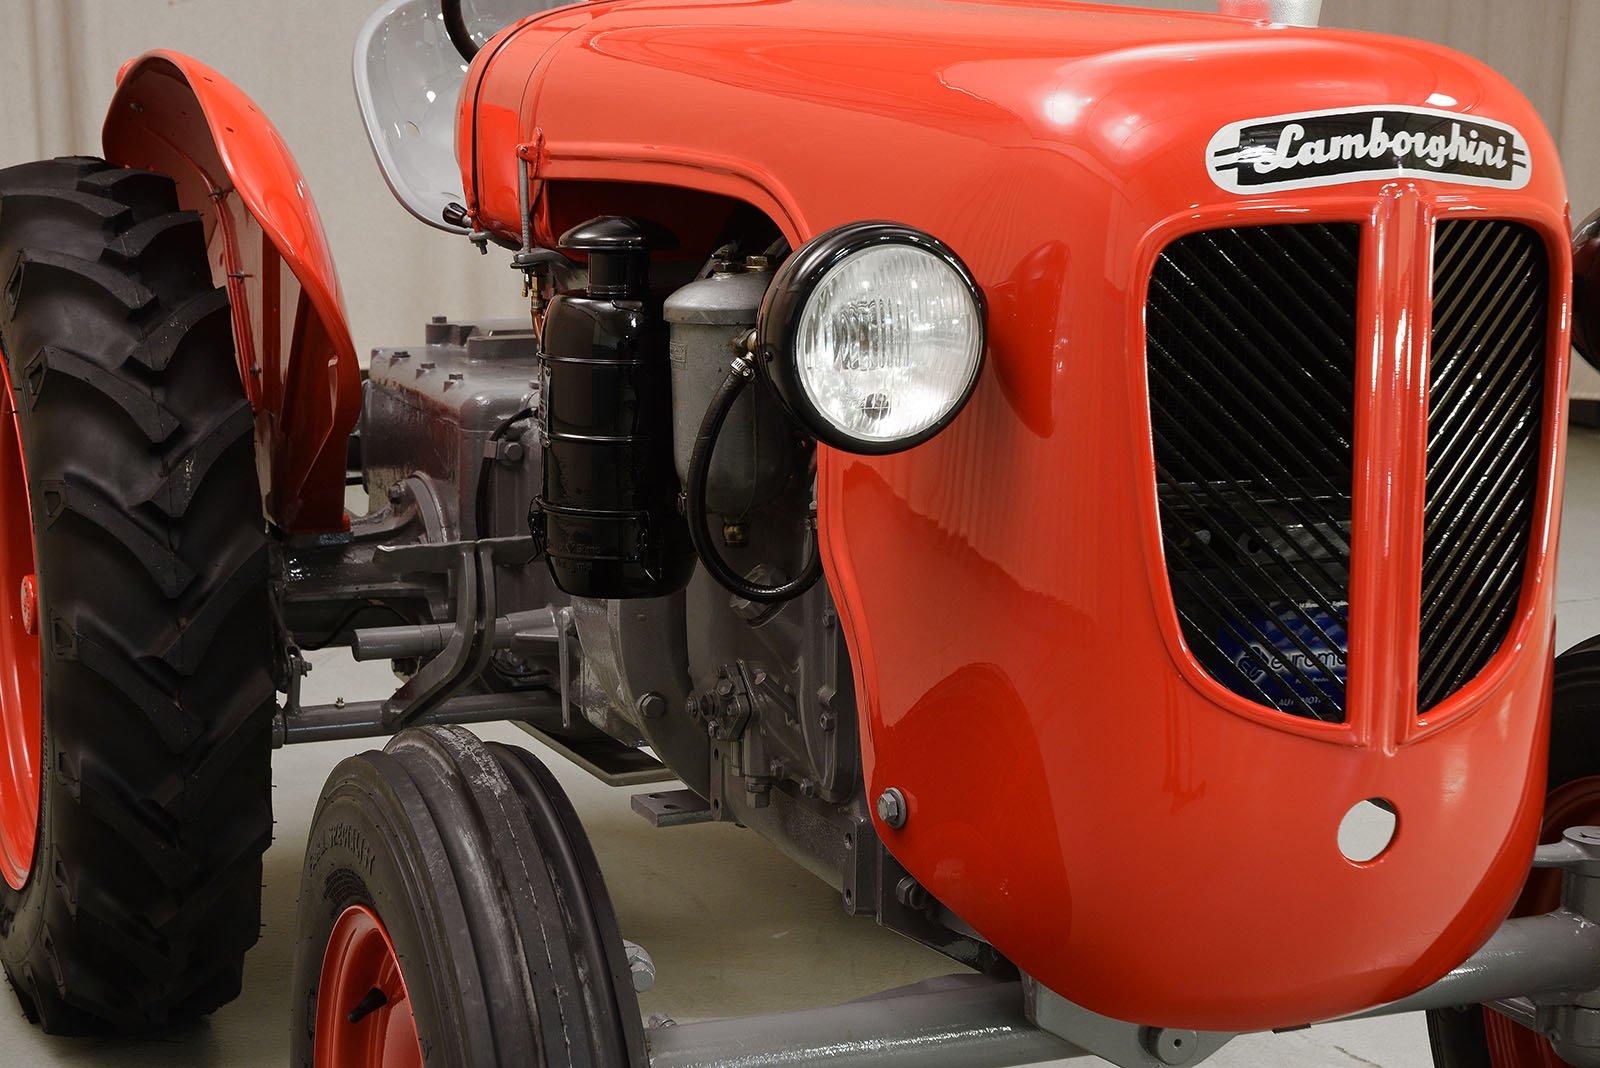 1955 Lamborghini DL 25 Tractor Hyman Ltd Classic Cars